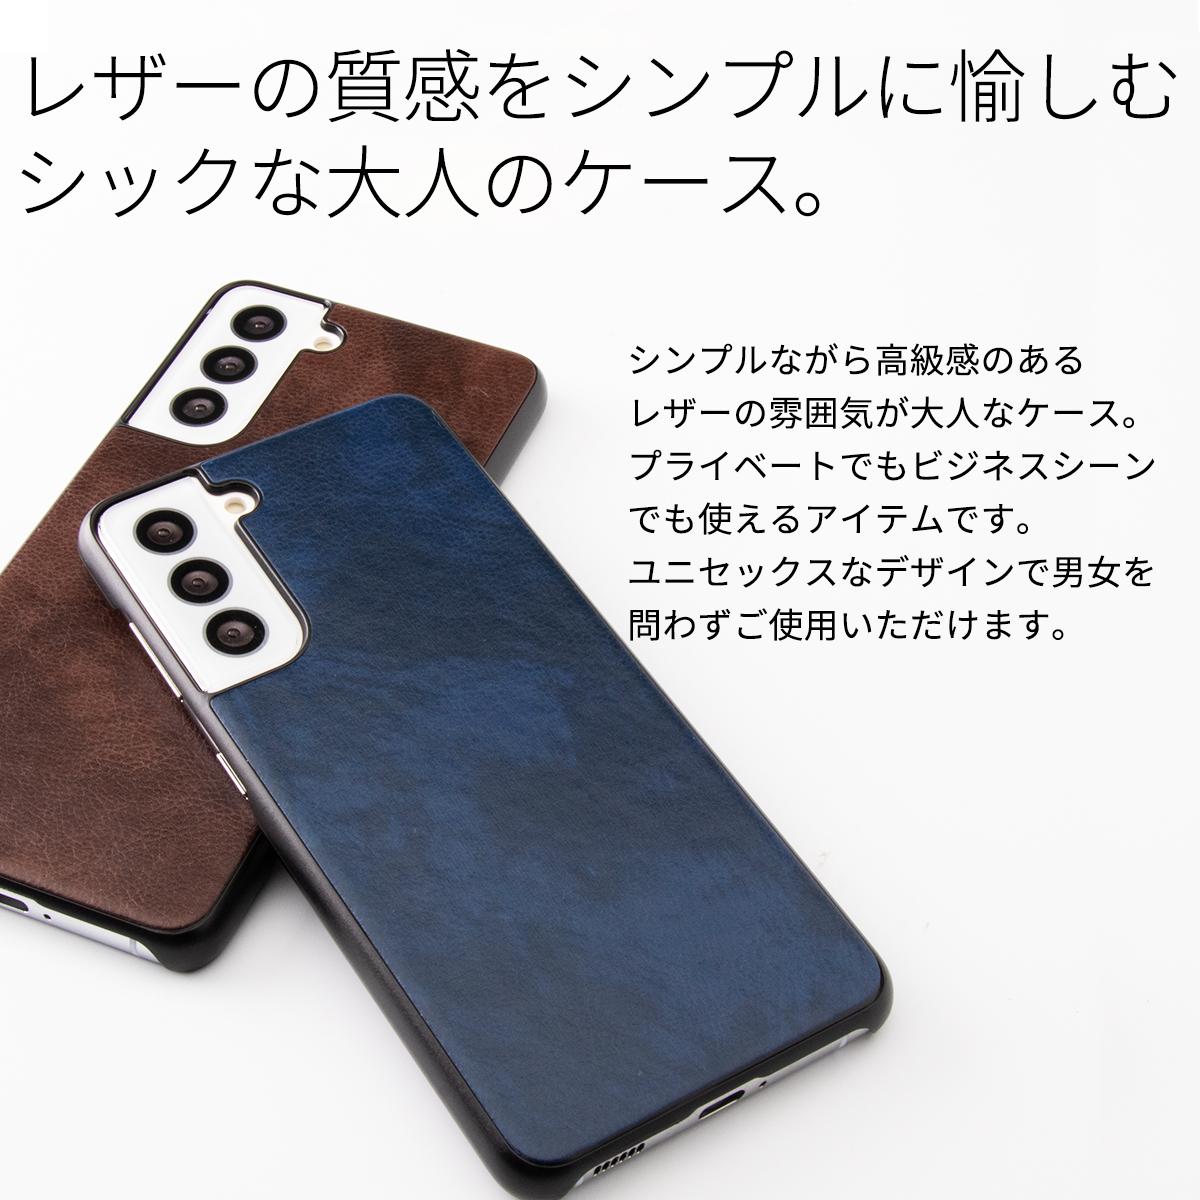 Galaxy S21 5G Galaxy S21+ 5G Galaxy S21 Ultra レザーハードケース